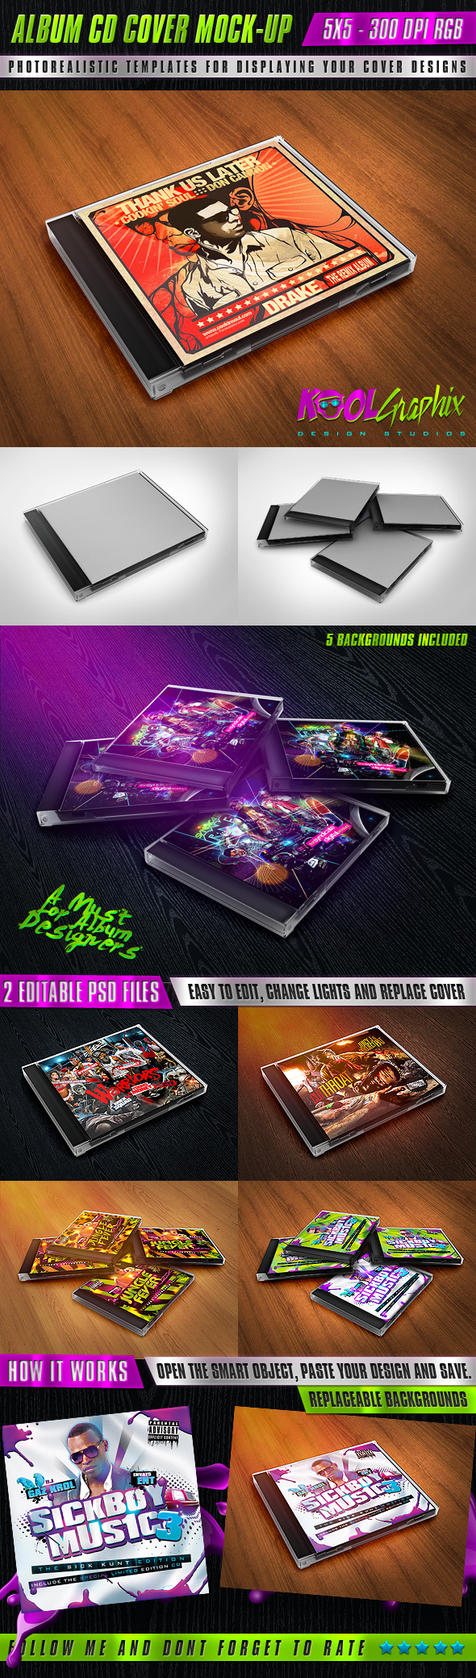 Album CD Cover Mock-Ups by KoolGfx